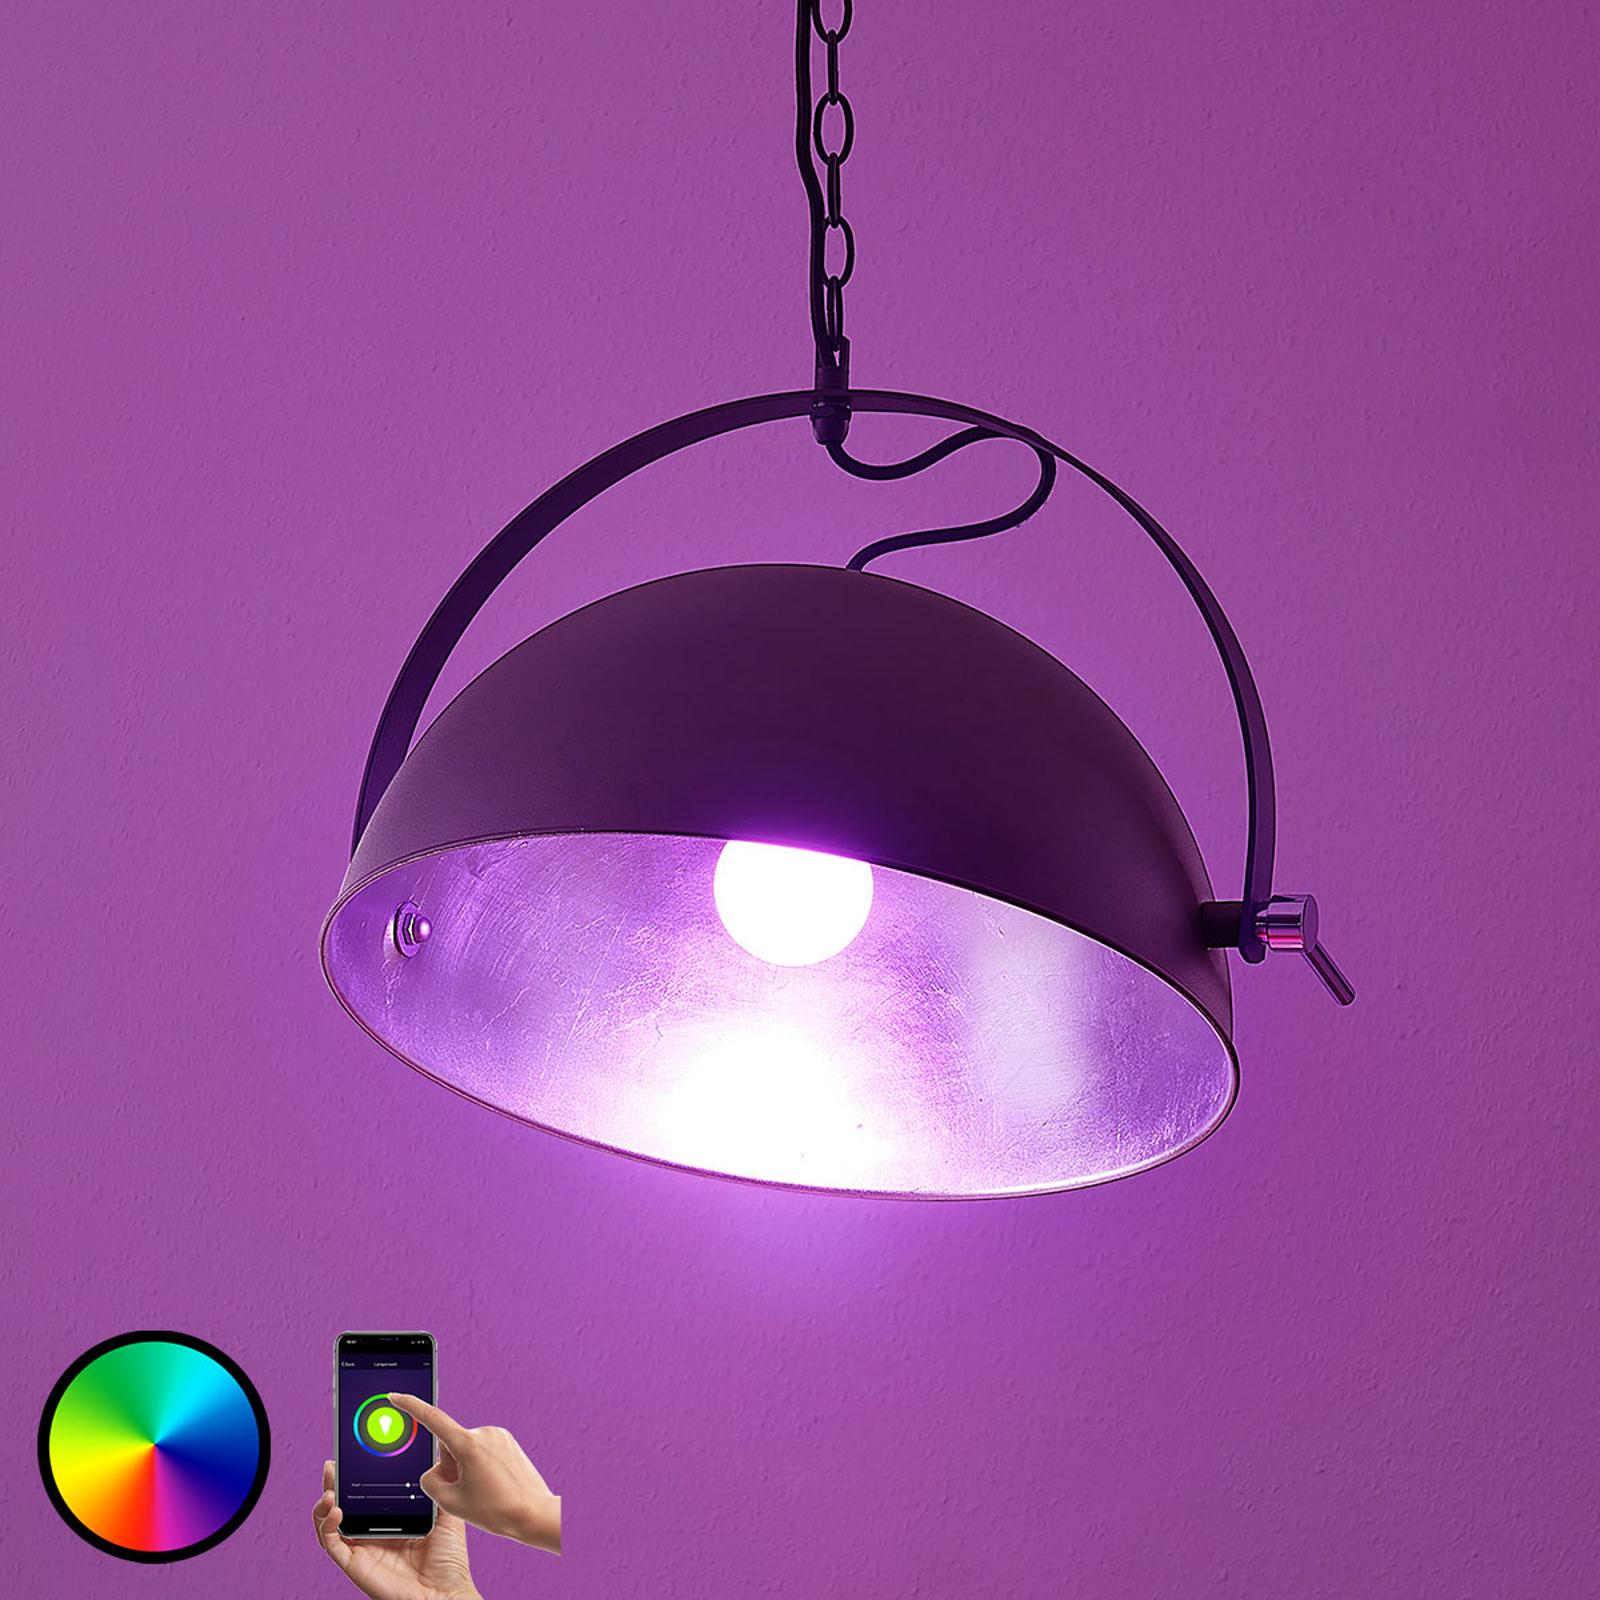 Lampa wisząca LED Muriel WiFi czarna/srebrna